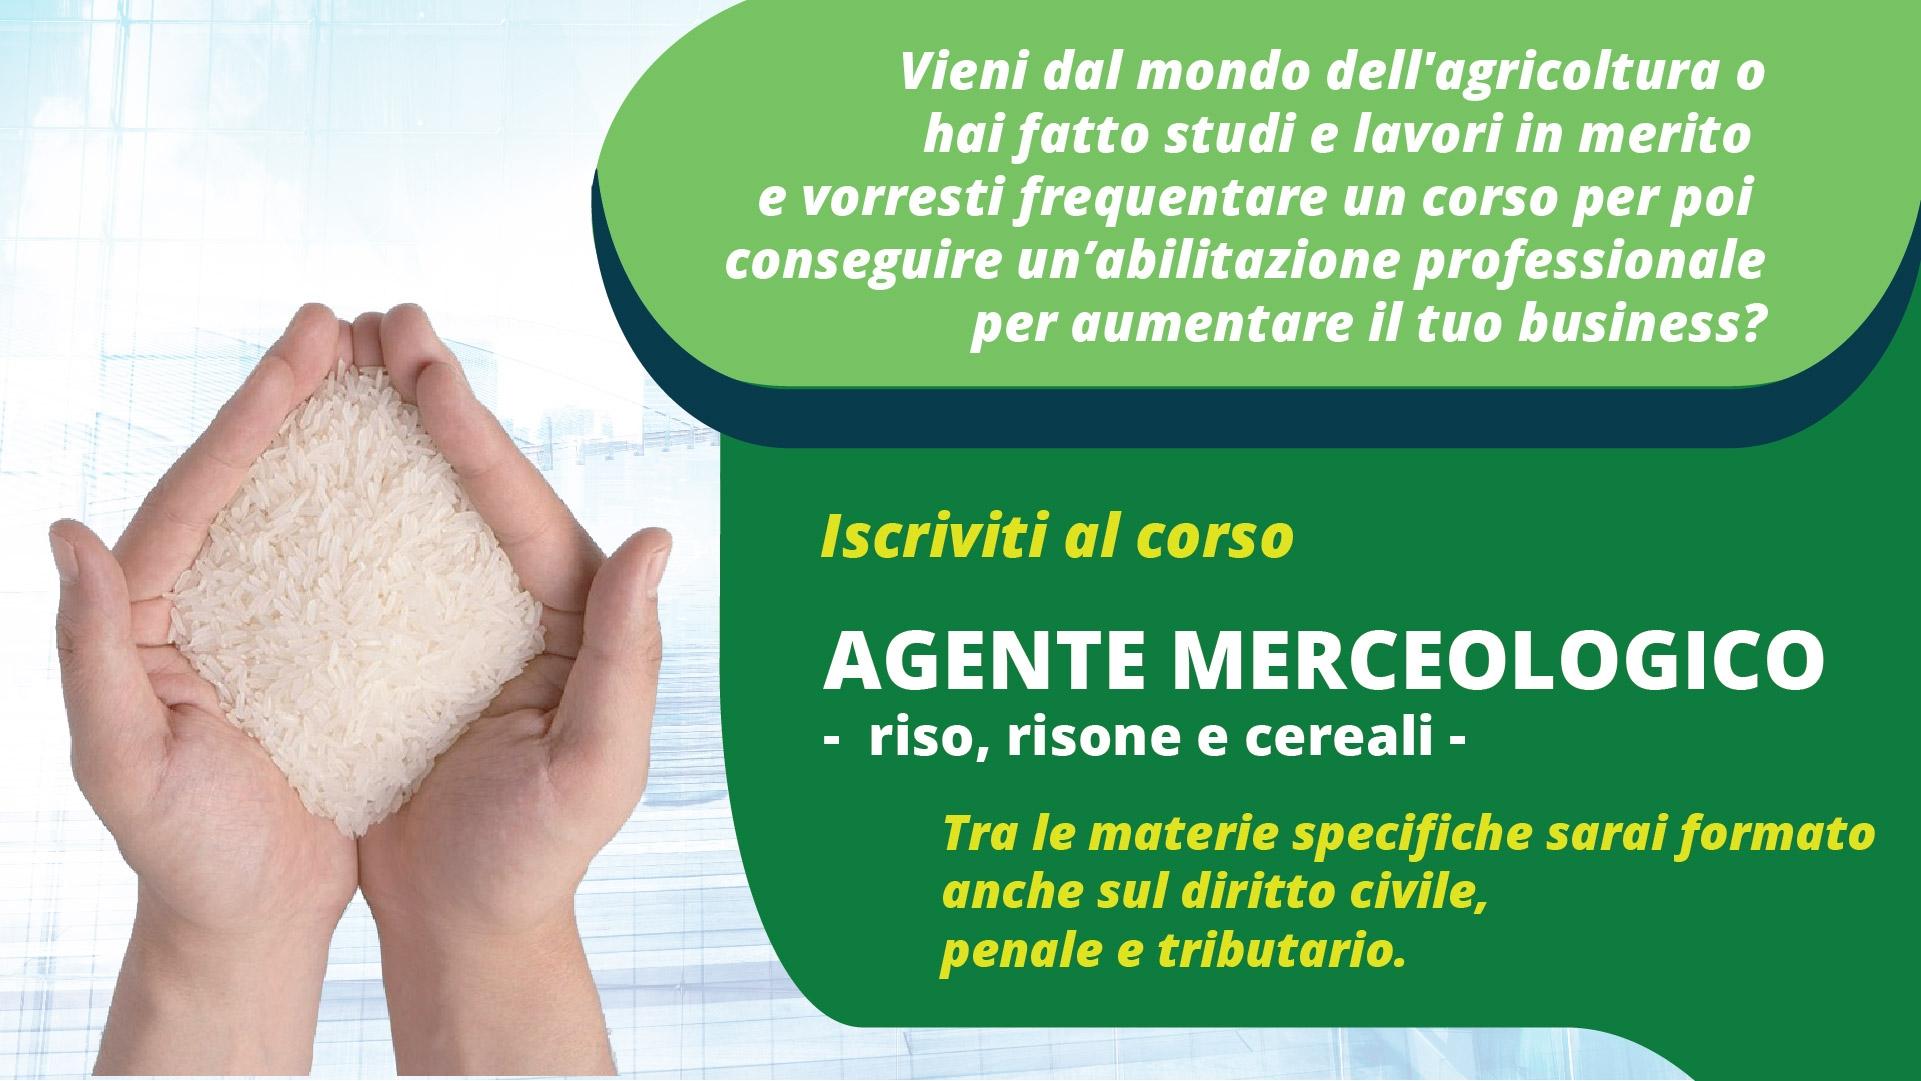 Agente Merceologico